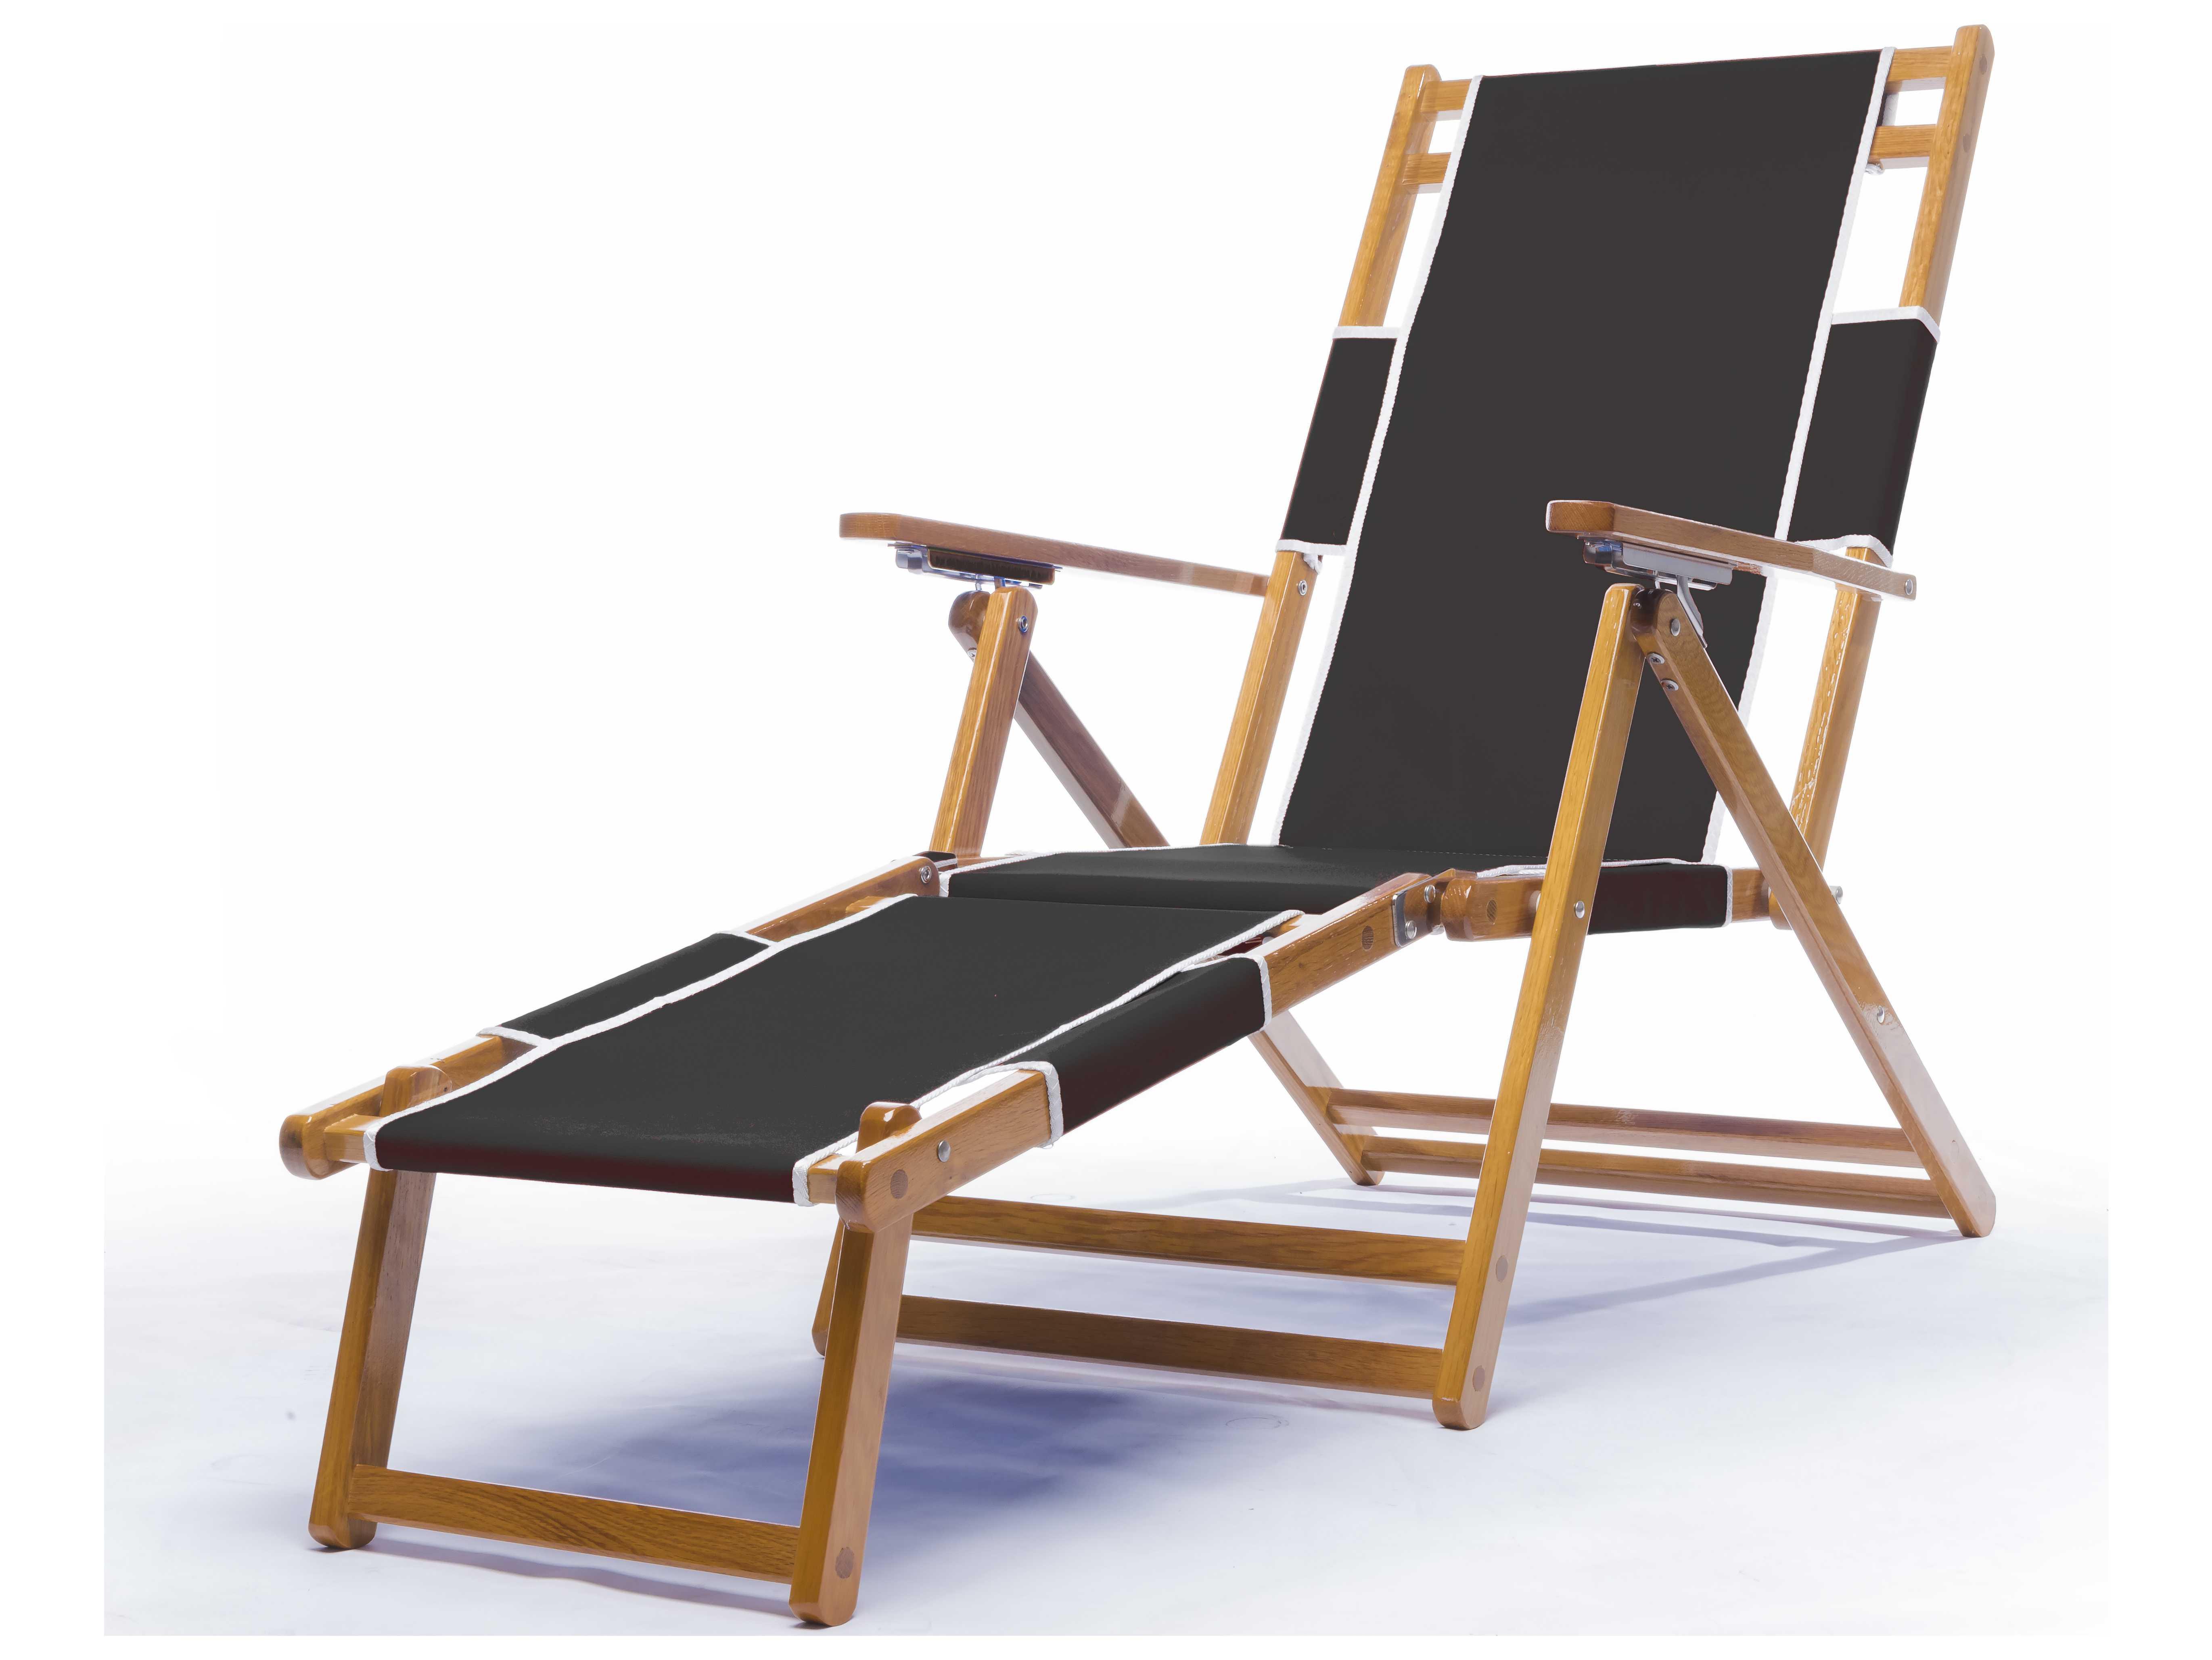 frankford umbrellas wooden beach chairs lounge set fc101set2